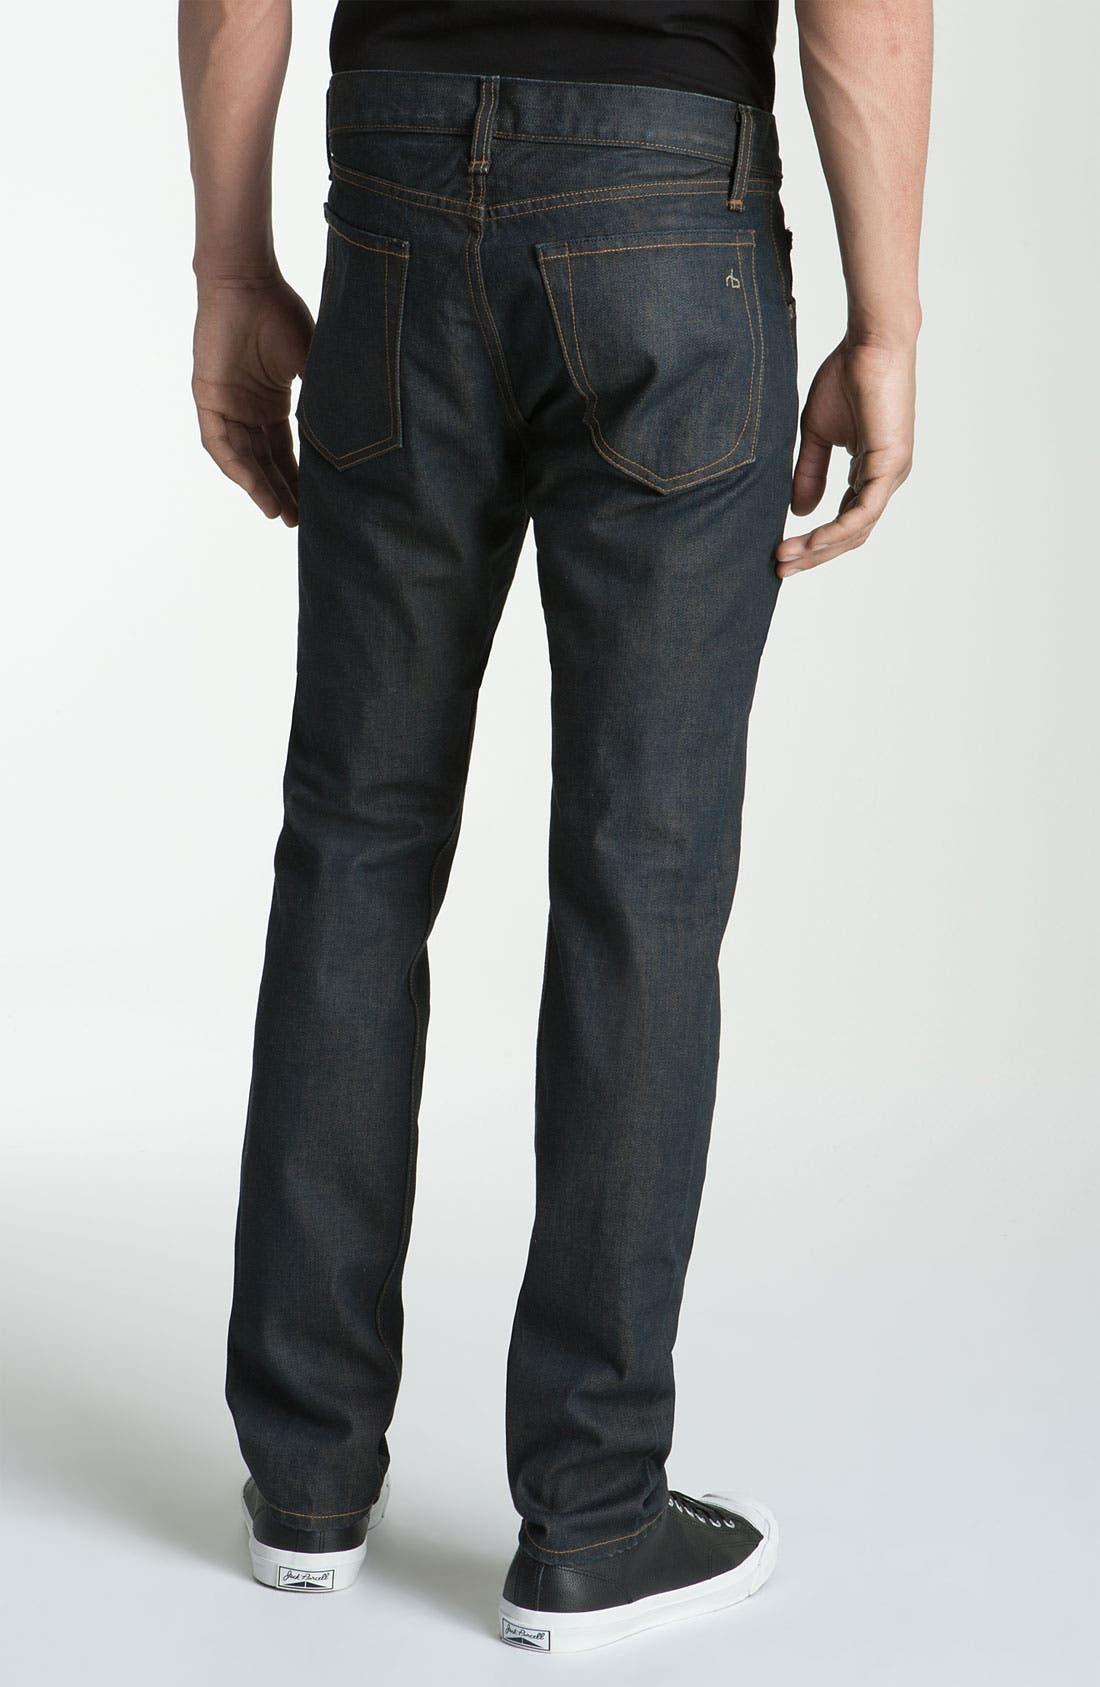 Alternate Image 1 Selected - rag & bone 'RB15X' Slim Straight Jeans (Olive One Year Wash)